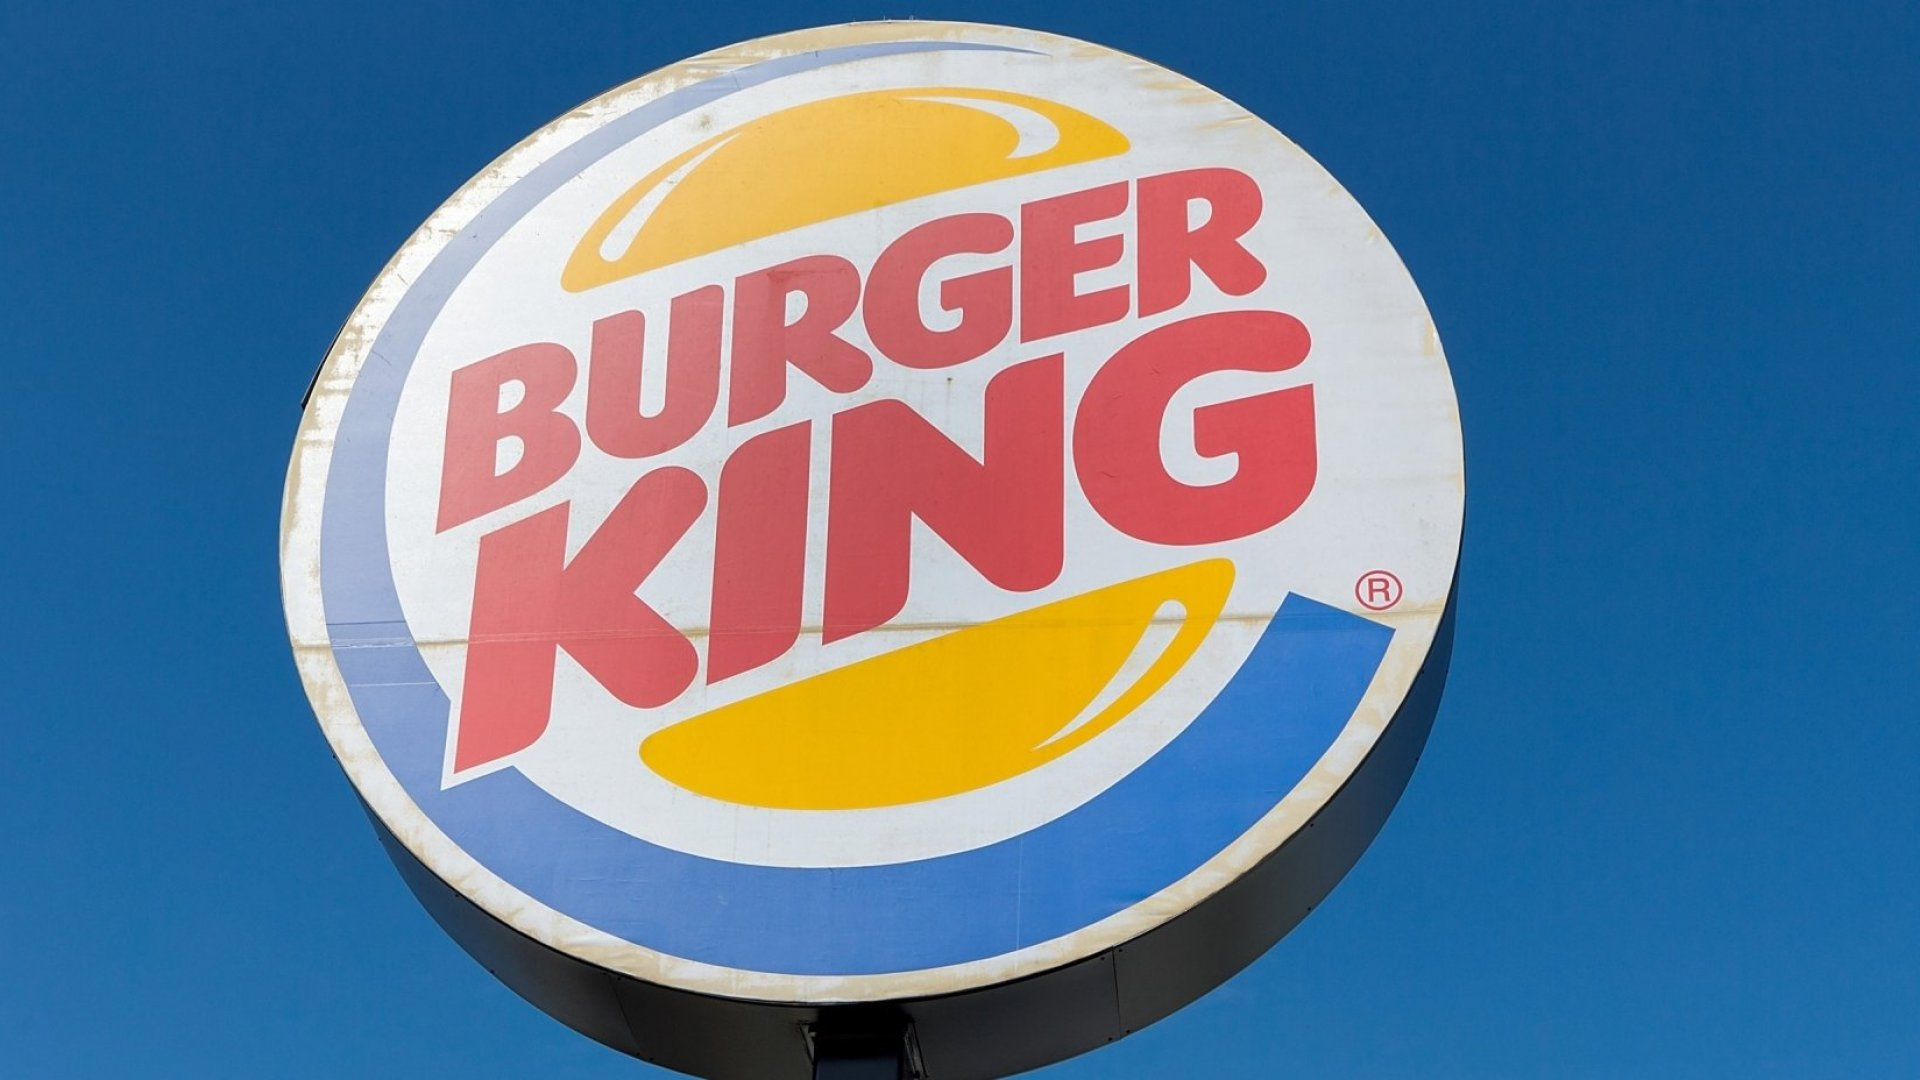 Making fast food great again?